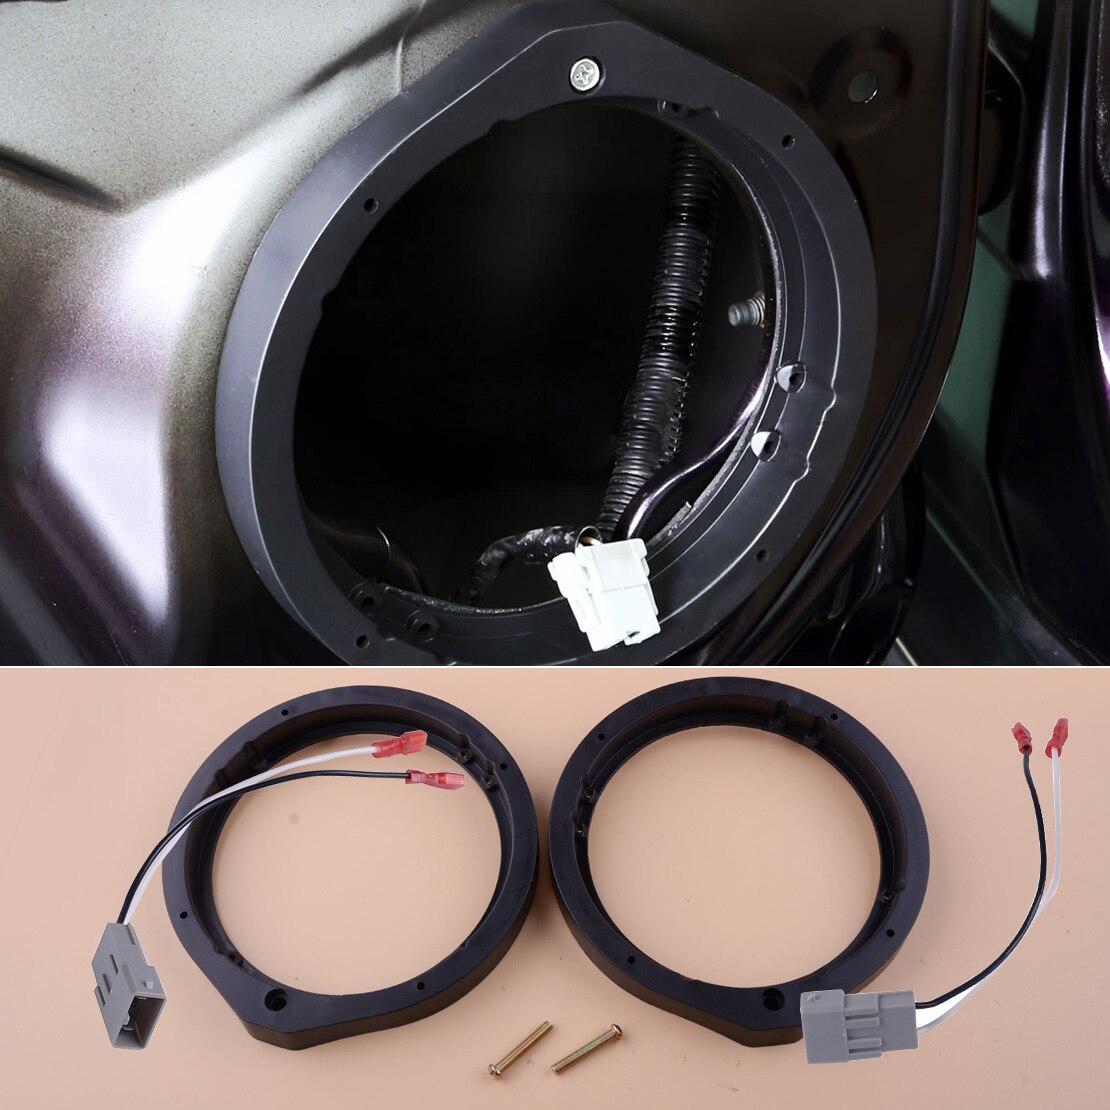 "2 uds adaptador de altavoz 165mm 6,5 ""/6,75"" y arnés de cable adecuado para Honda Civic Accord Crosstour CR-Z Insight"